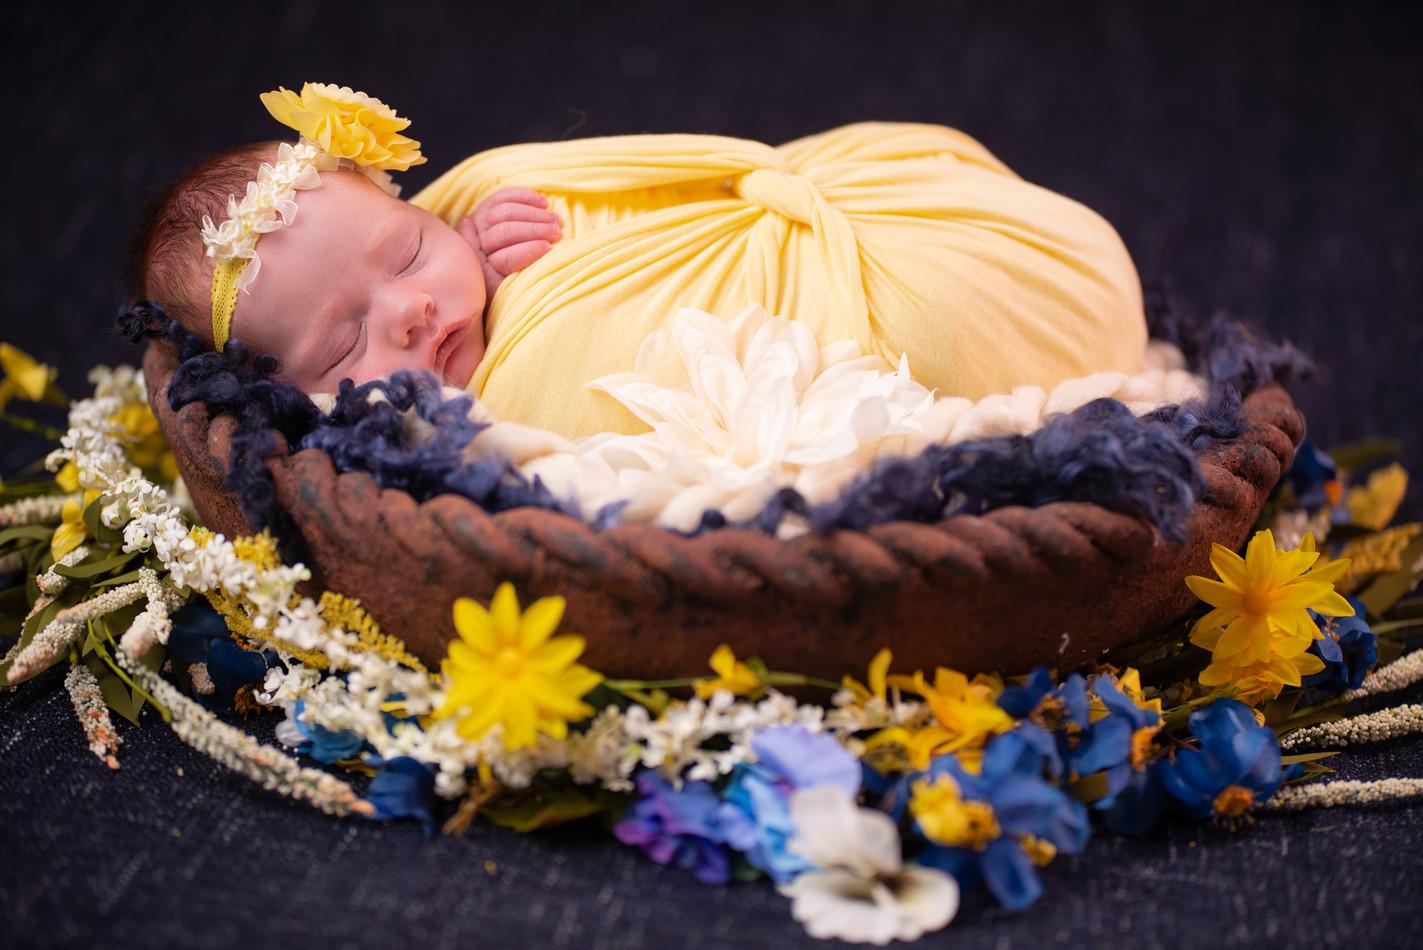 Newborn in rustic wrought iron bowl